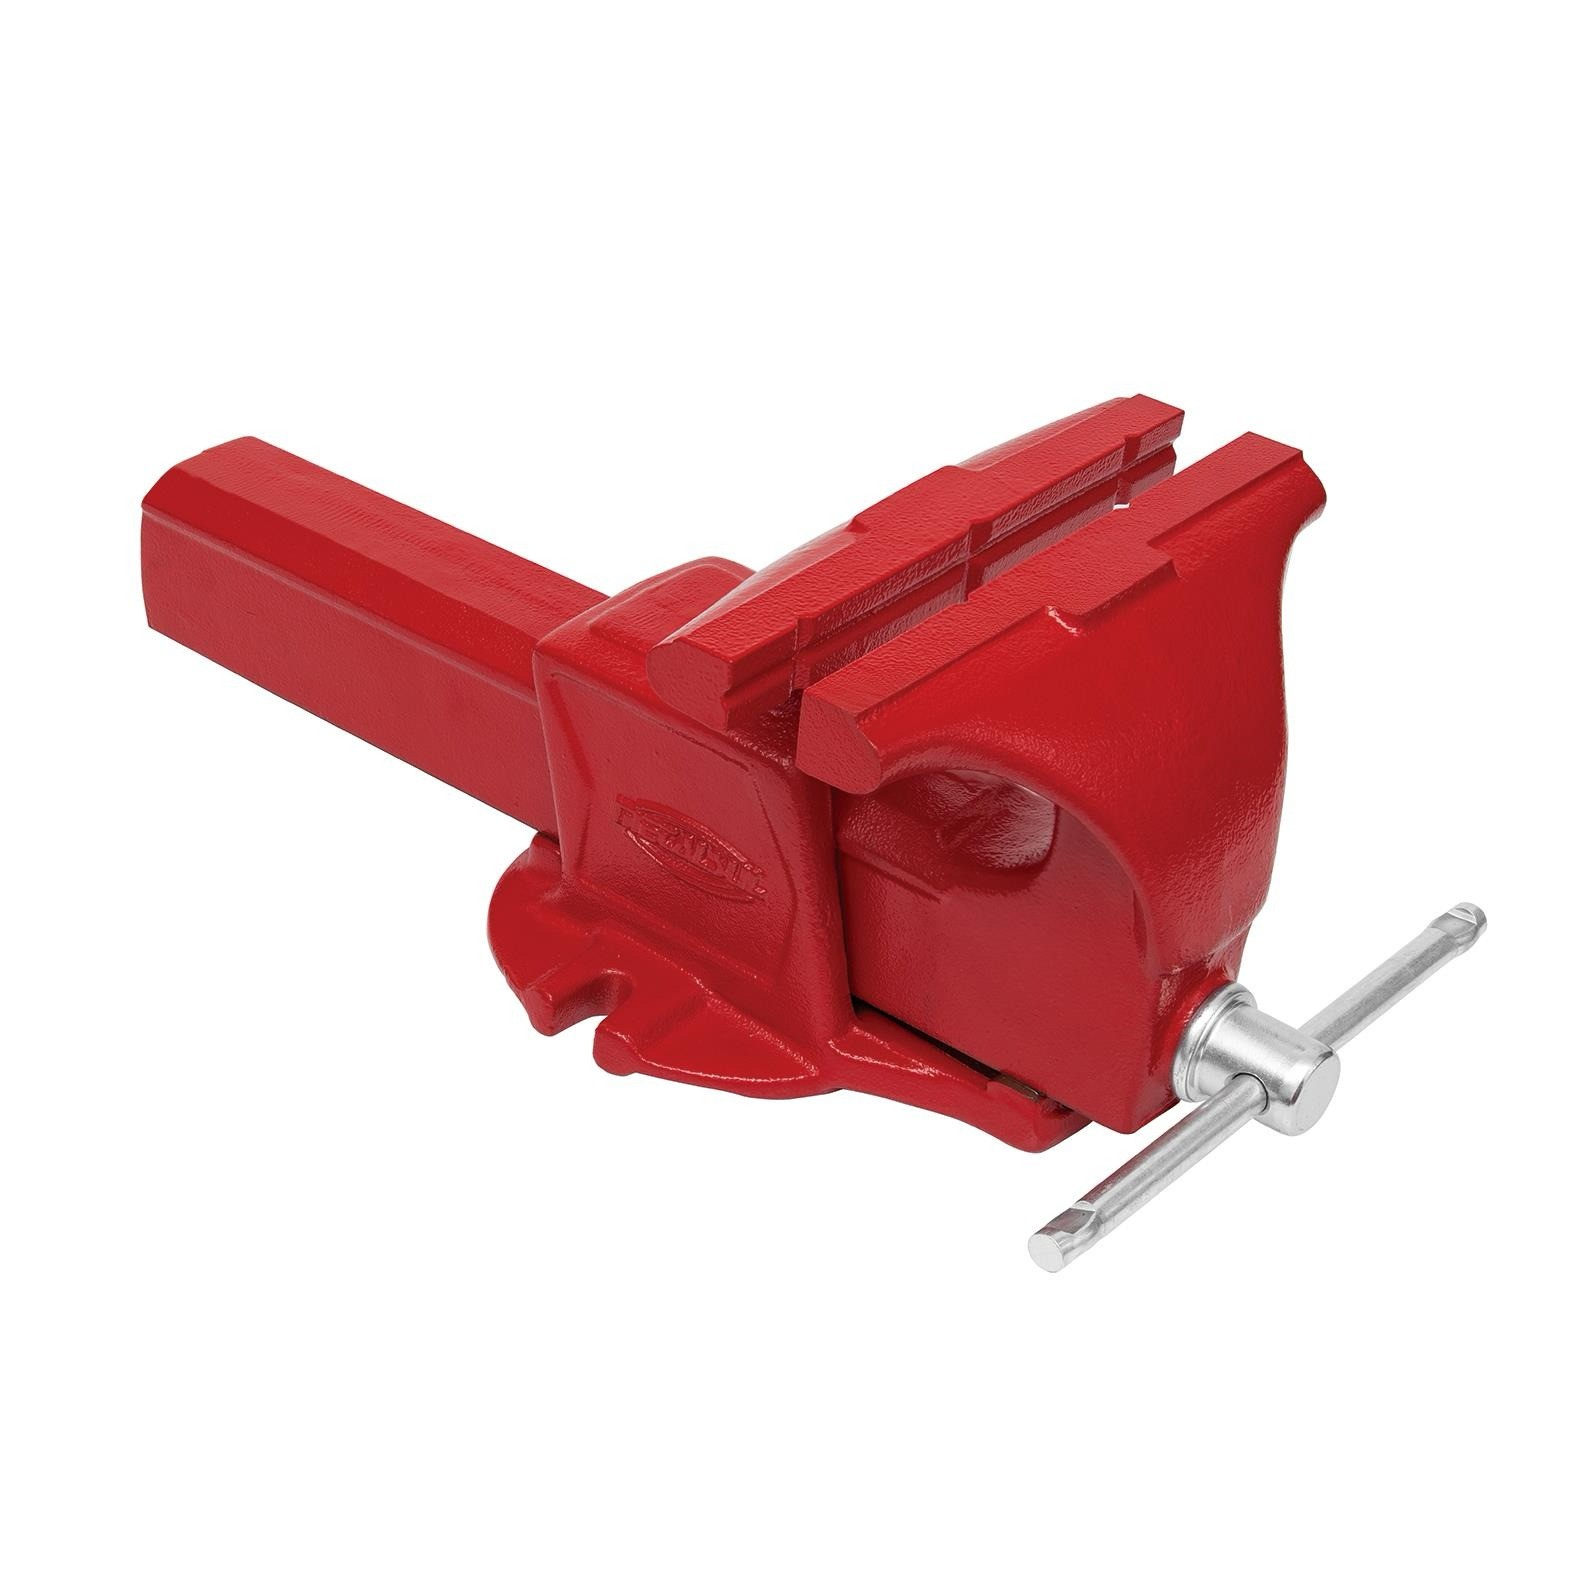 Torno de Bancada N 2 50mm - TMF02 - Metalsul